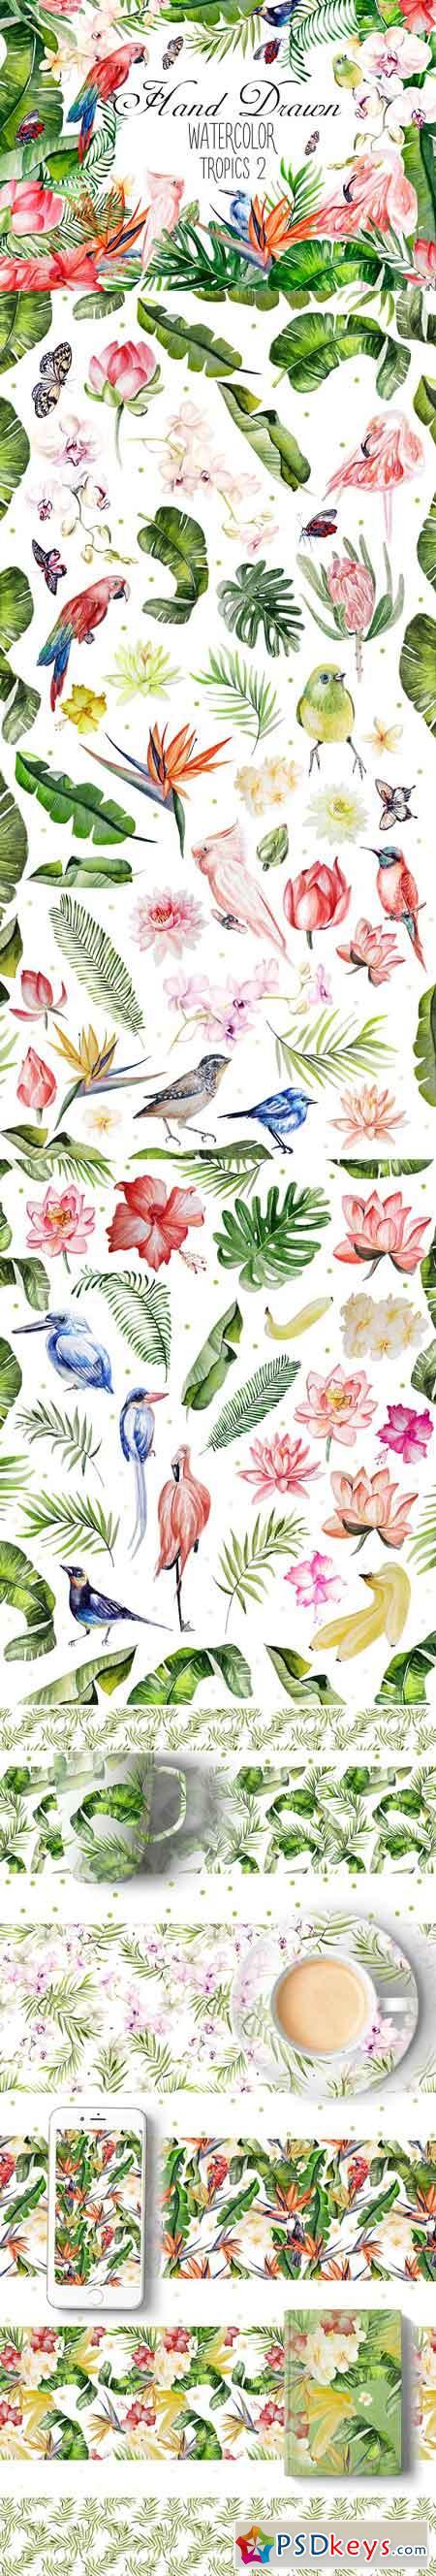 Hand Drawn watercolor TROPICS 2 1590067